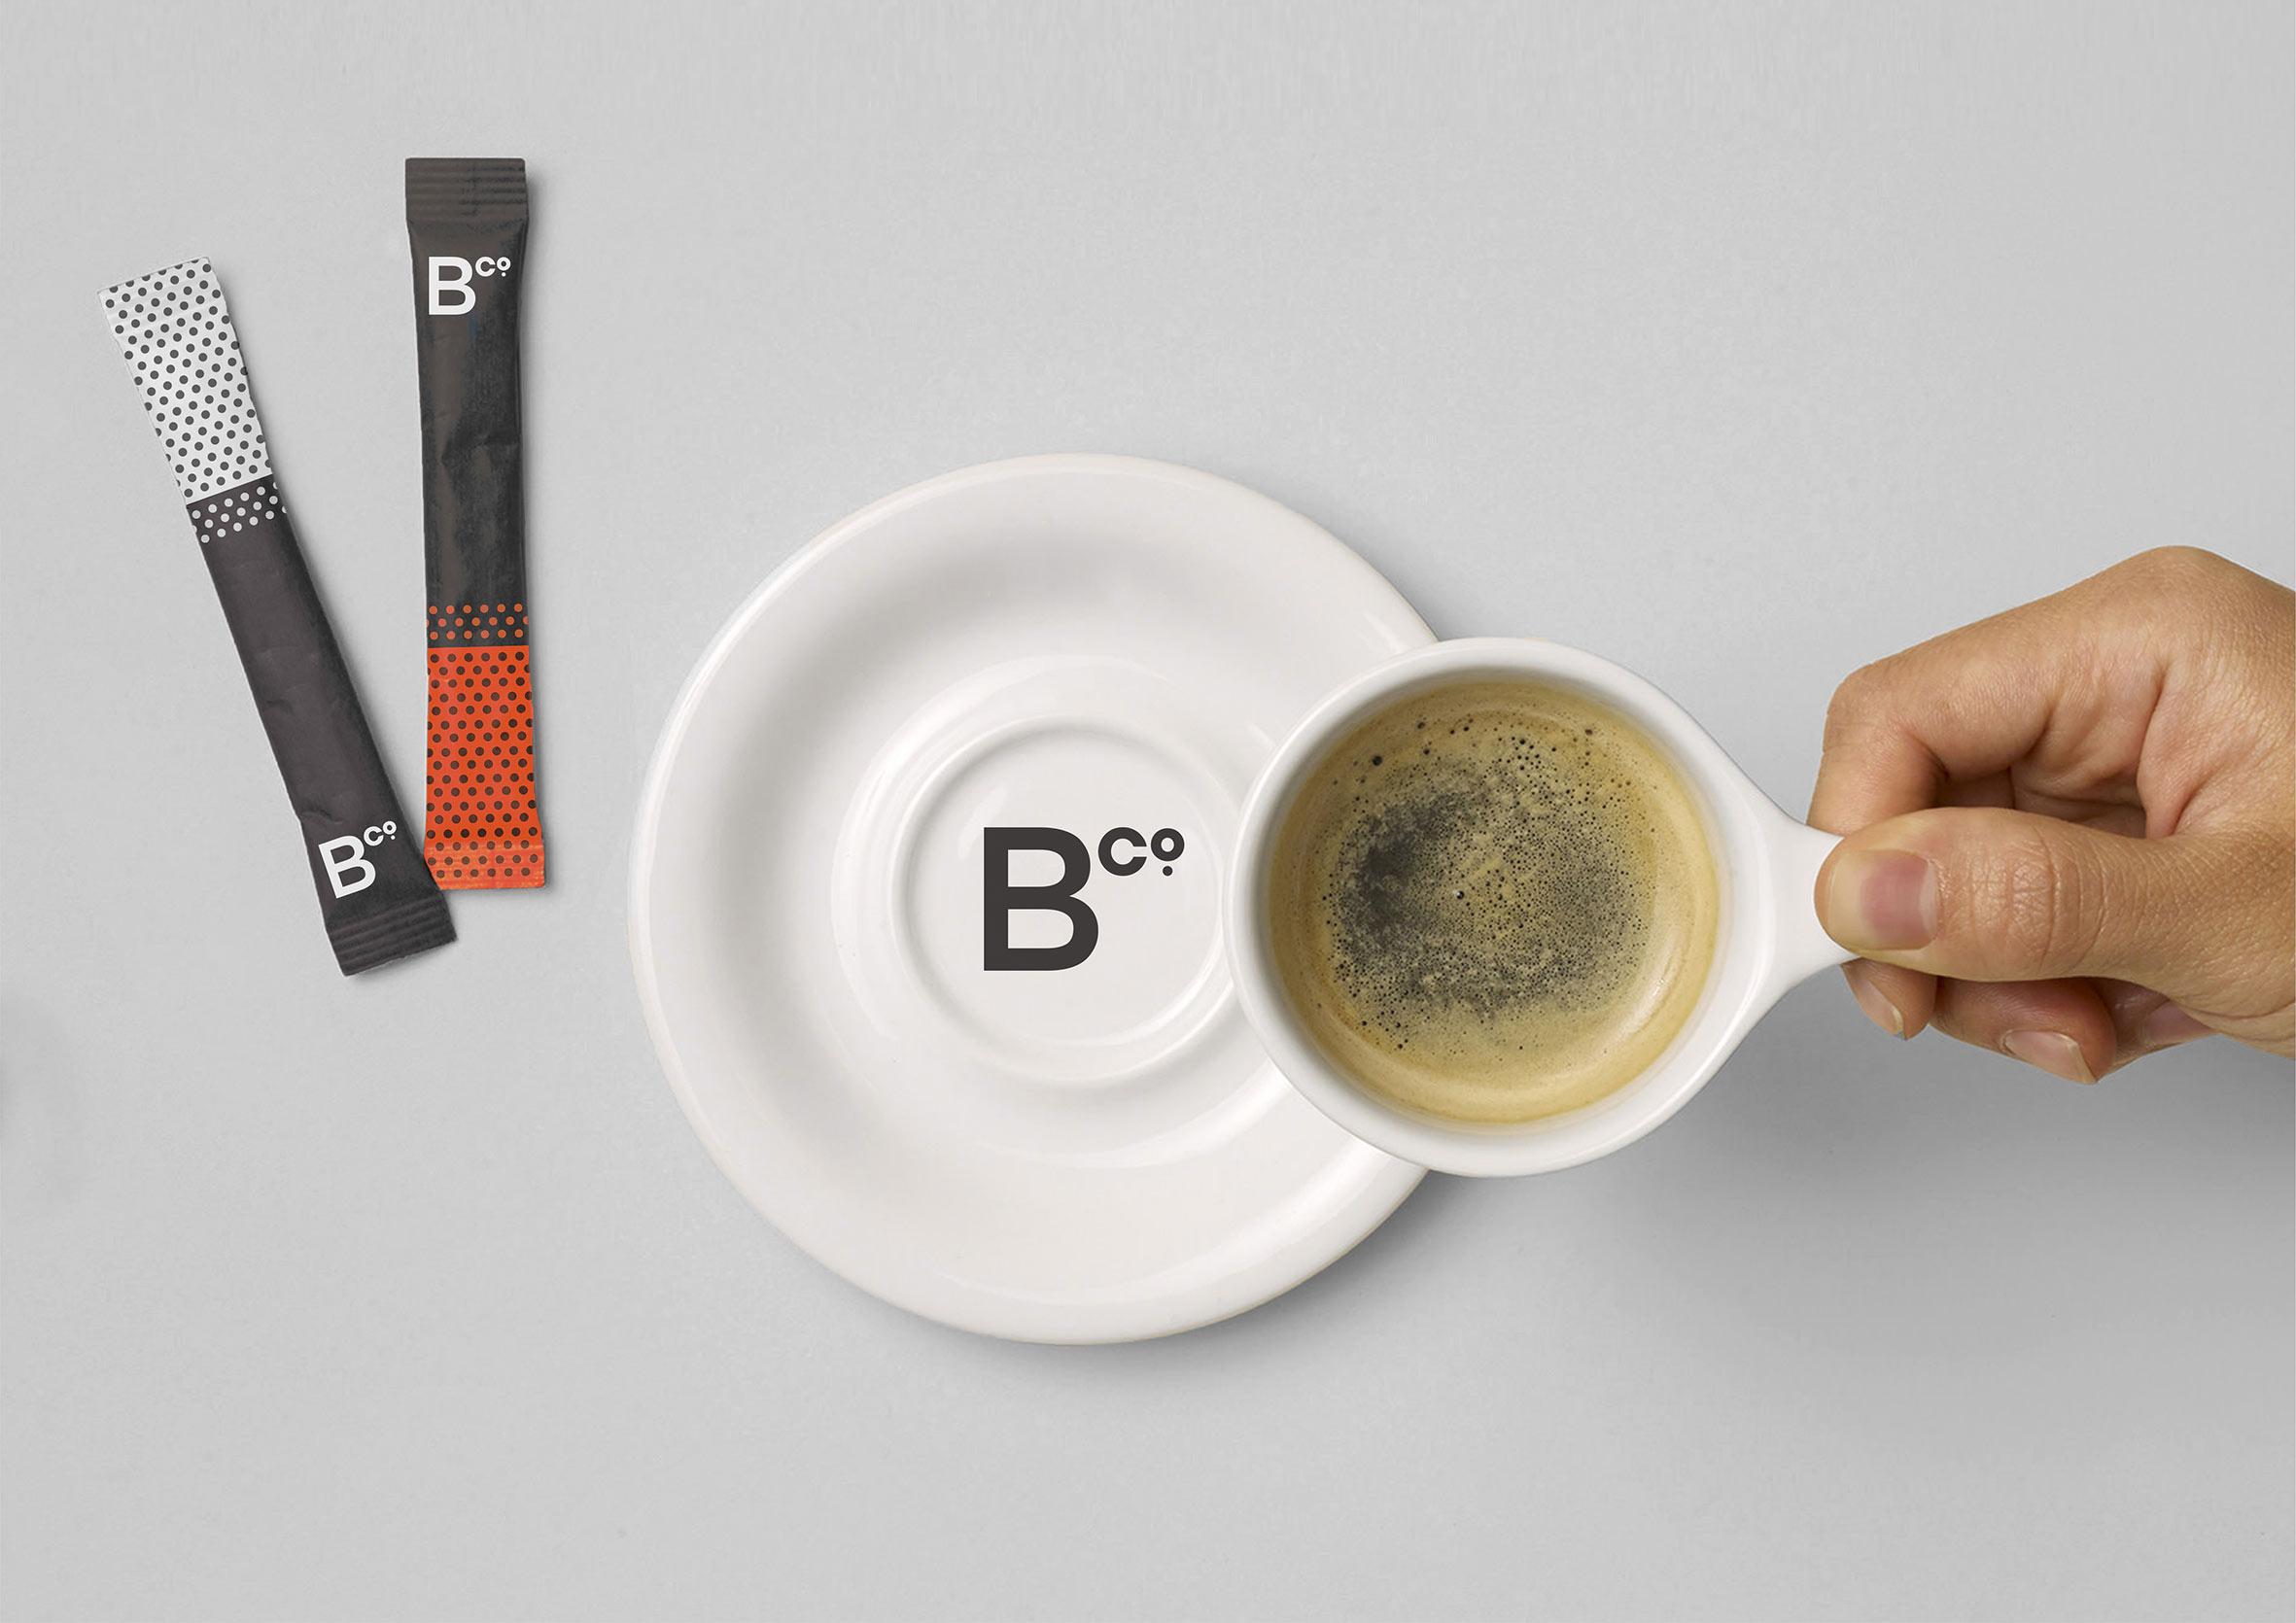 Blacksmith-identite-branding-coffee-cup-sugar.jpg